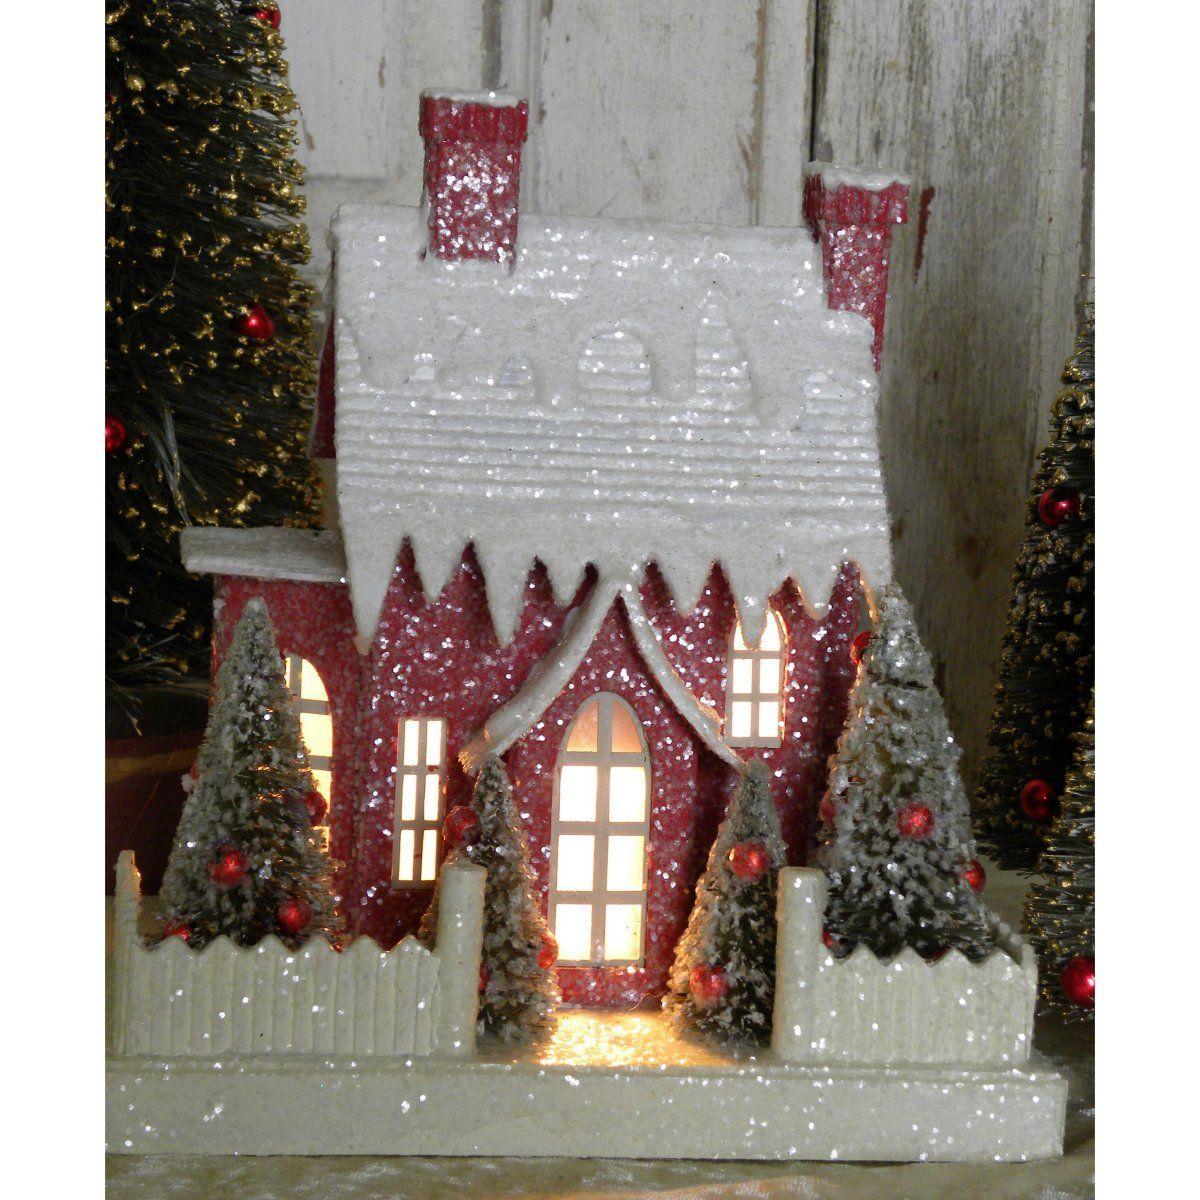 Kd vintage christmas woodland cottage navidad for Villas navidenas de porcelana